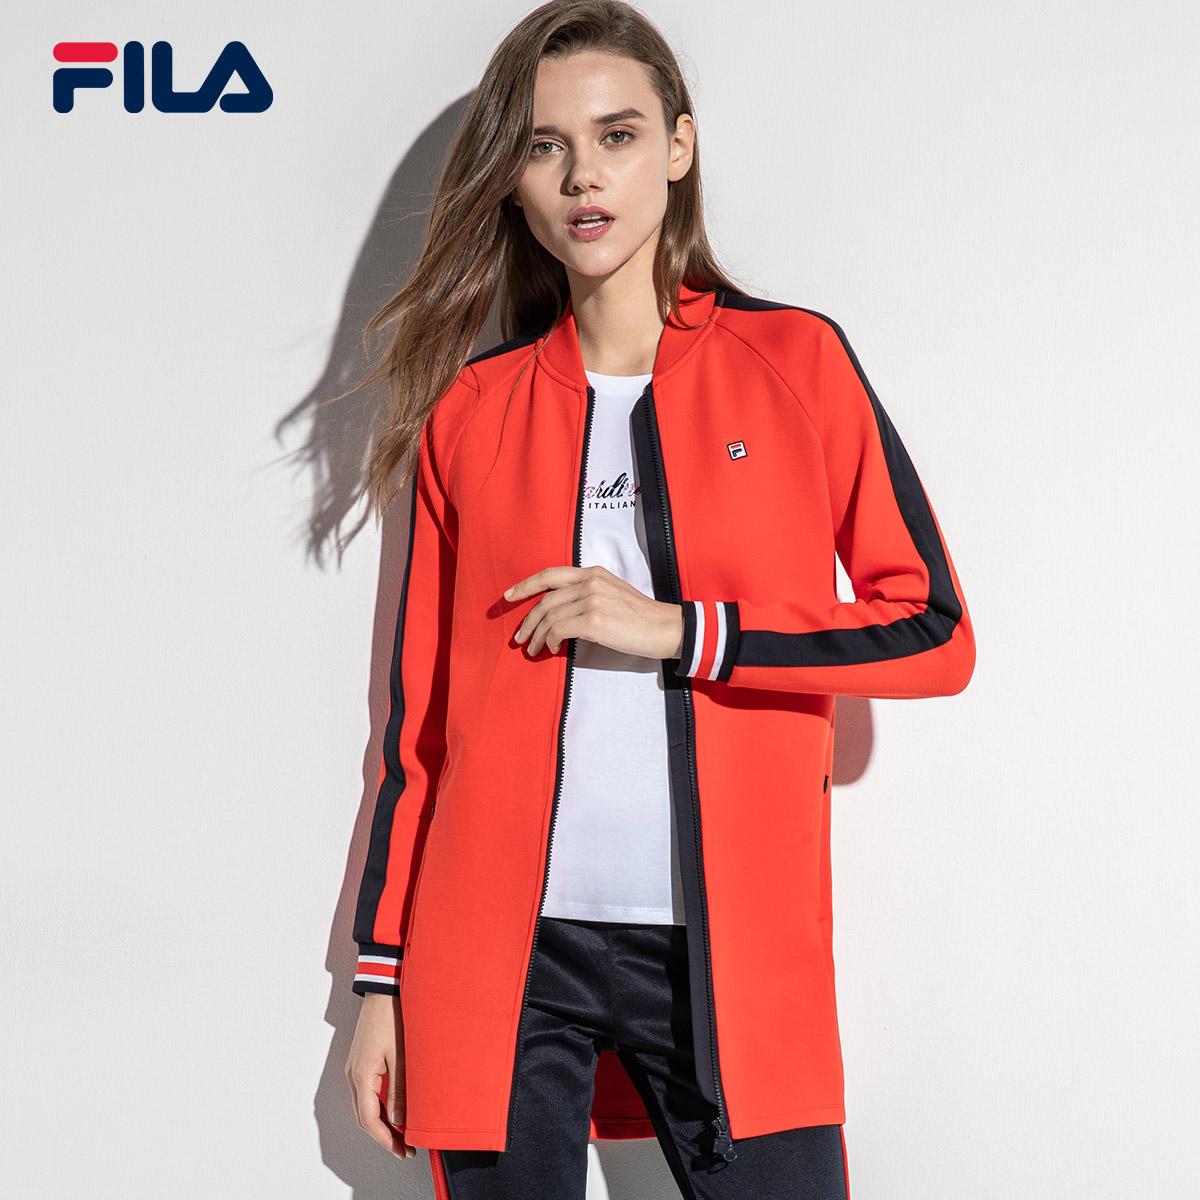 FILA斐乐女外套2018年秋季新款时尚运动休闲外套针织舒适上衣女